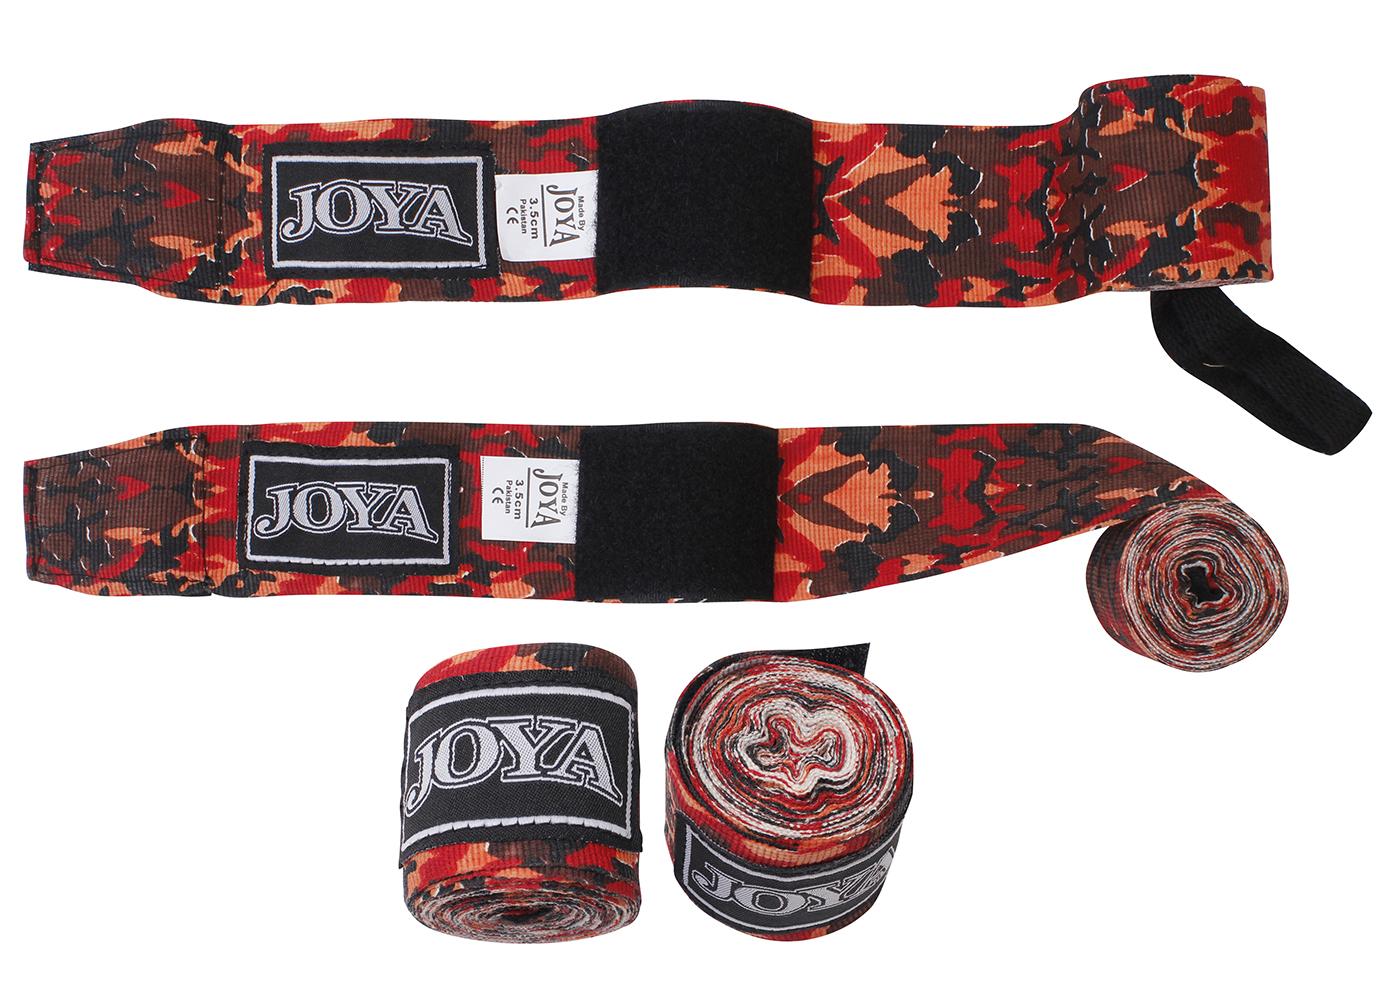 Joya Camouflage Bandages - Katoen - 350cm - Rood - jokasport.nl